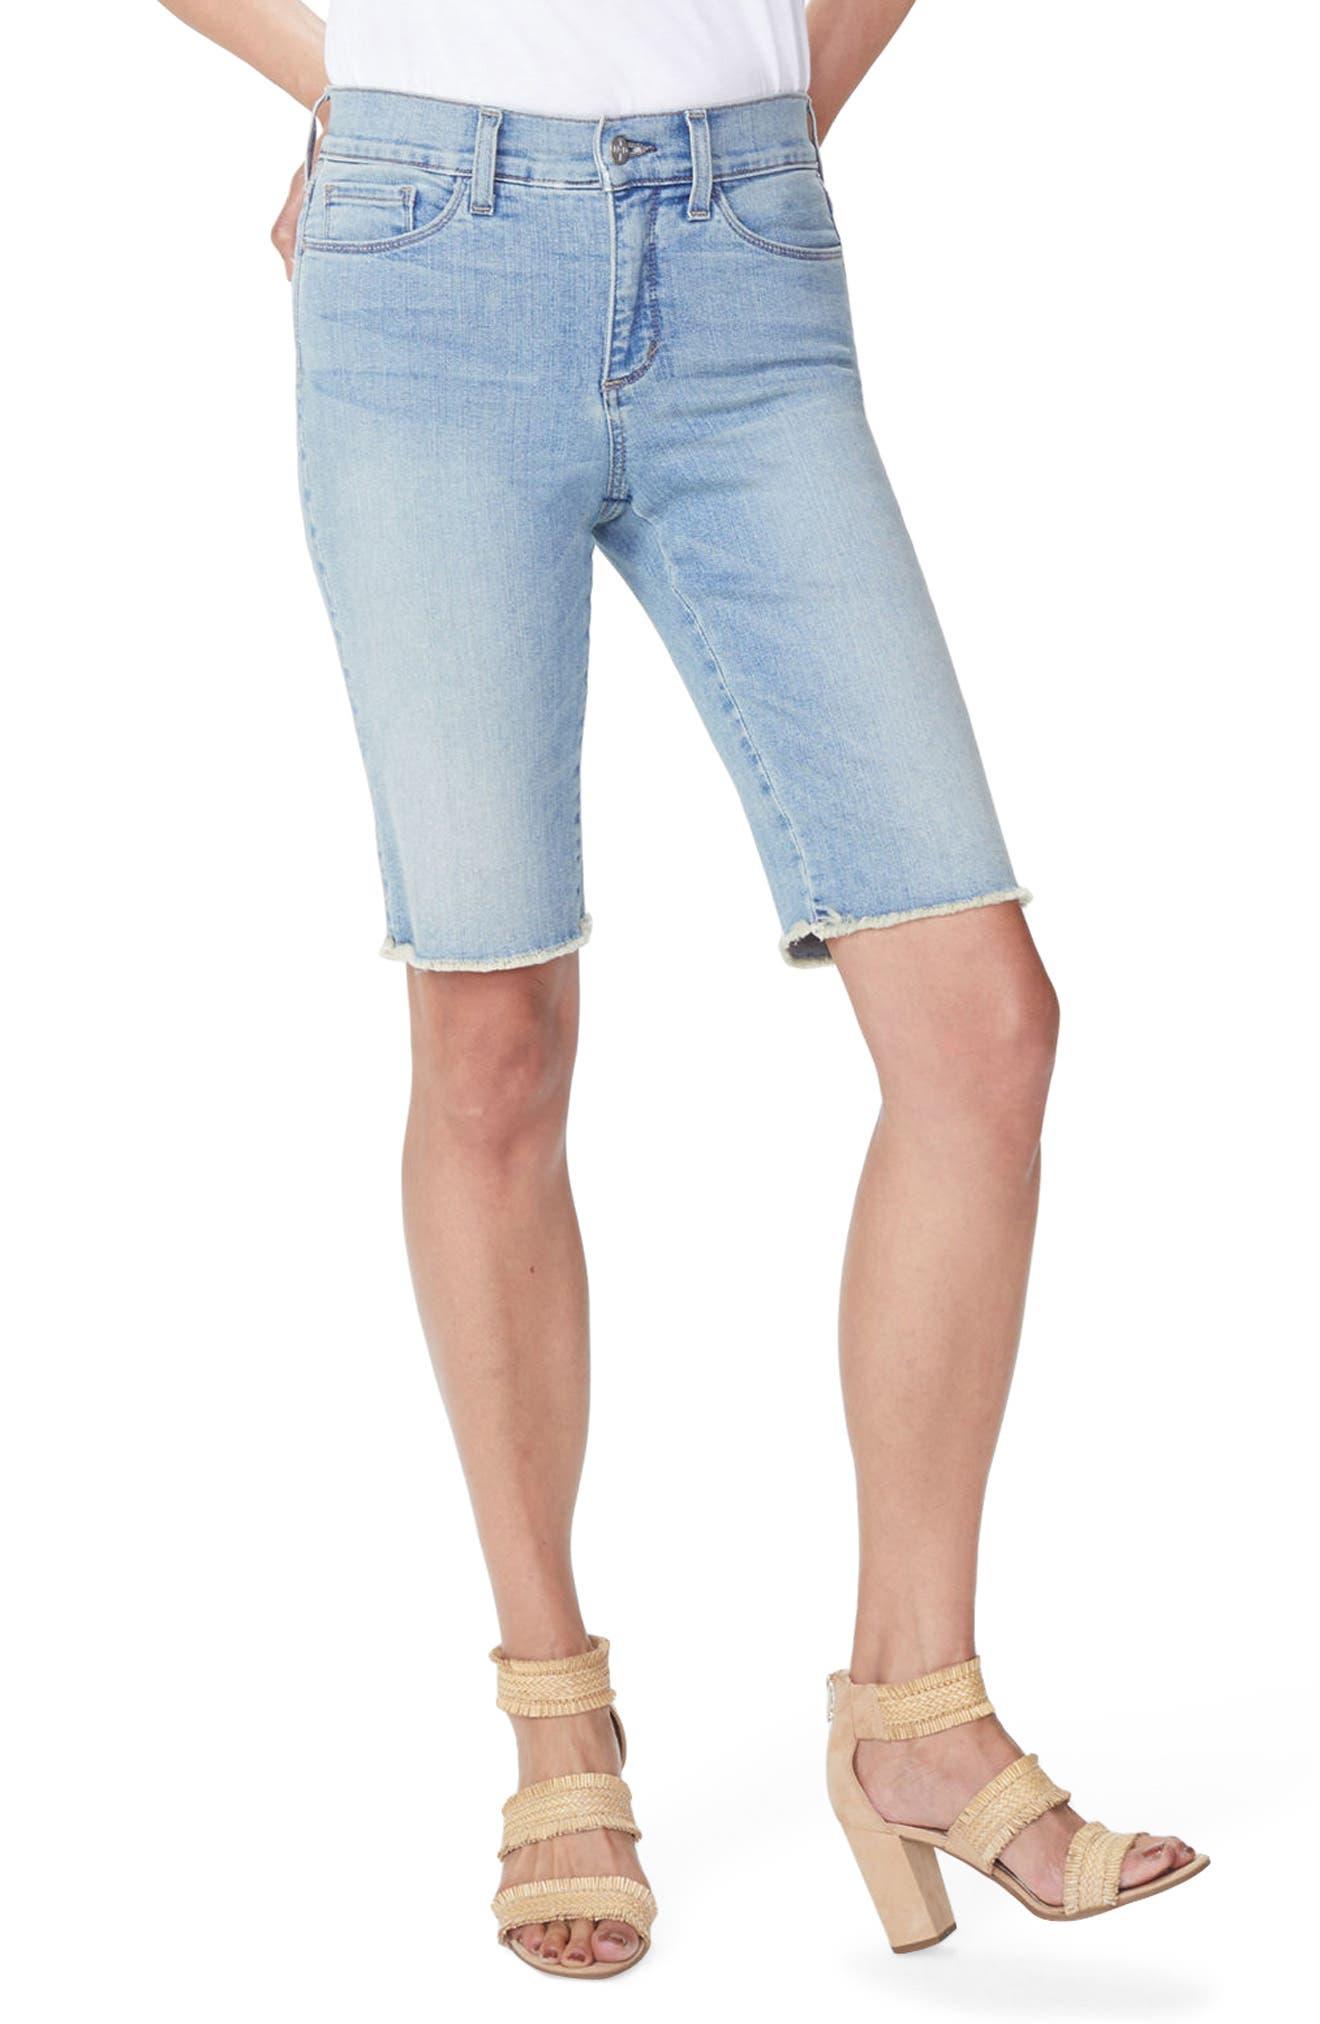 Briella Frayed Hem Denim Bermuda Shorts,                         Main,                         color, WESTLAND